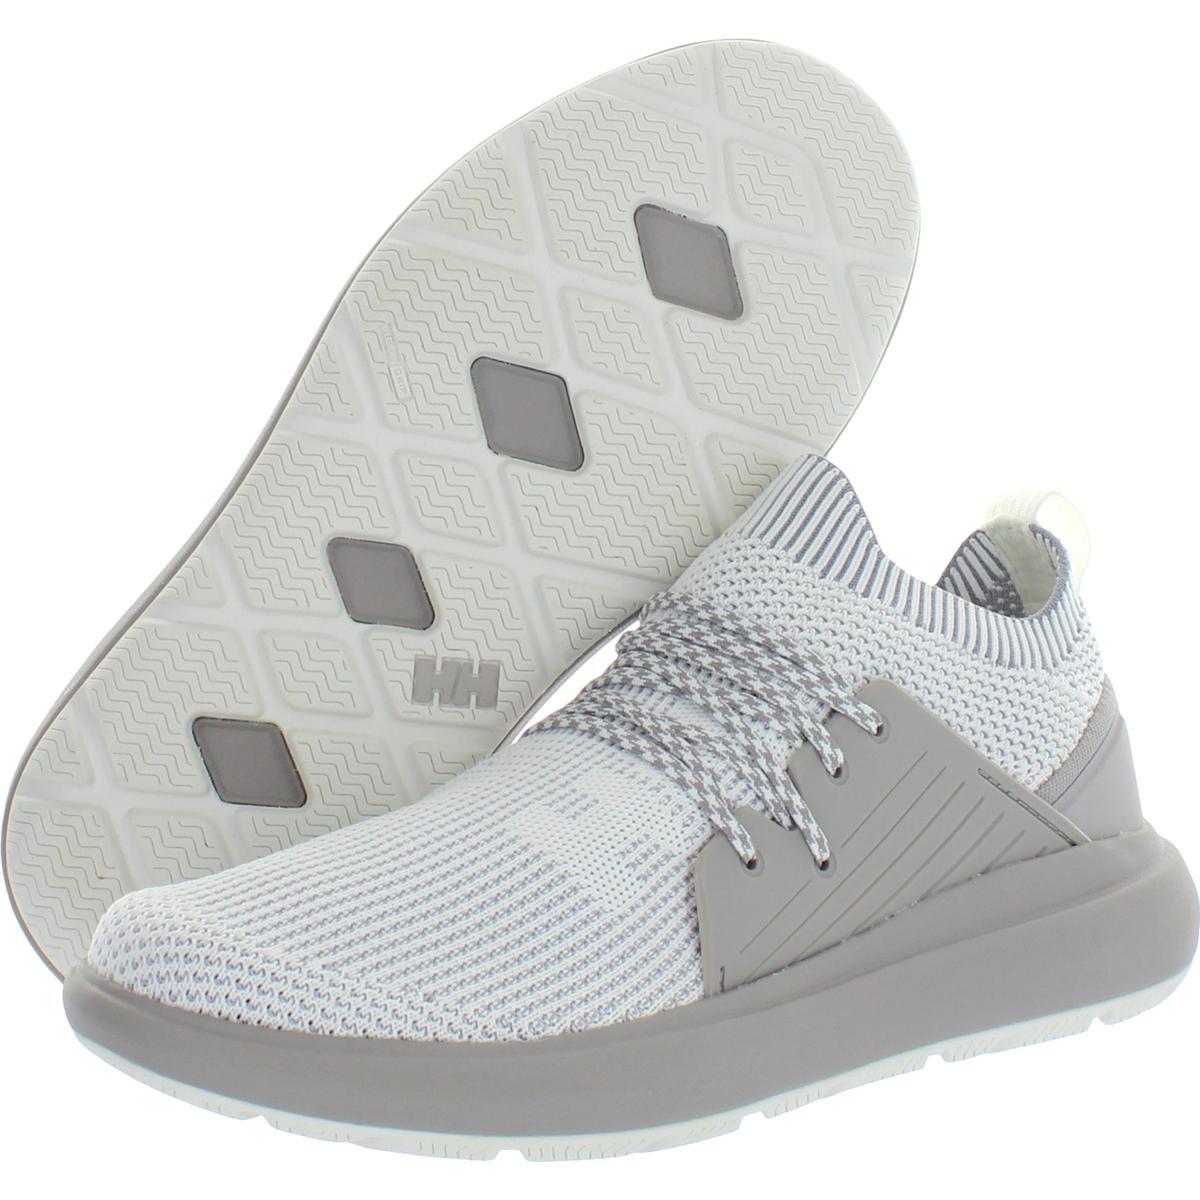 thumbnail 11 - Helly-Hansen-Womens-Razorskiff-Knit-Breathable-Fashion-Sneakers-Shoes-BHFO-8932